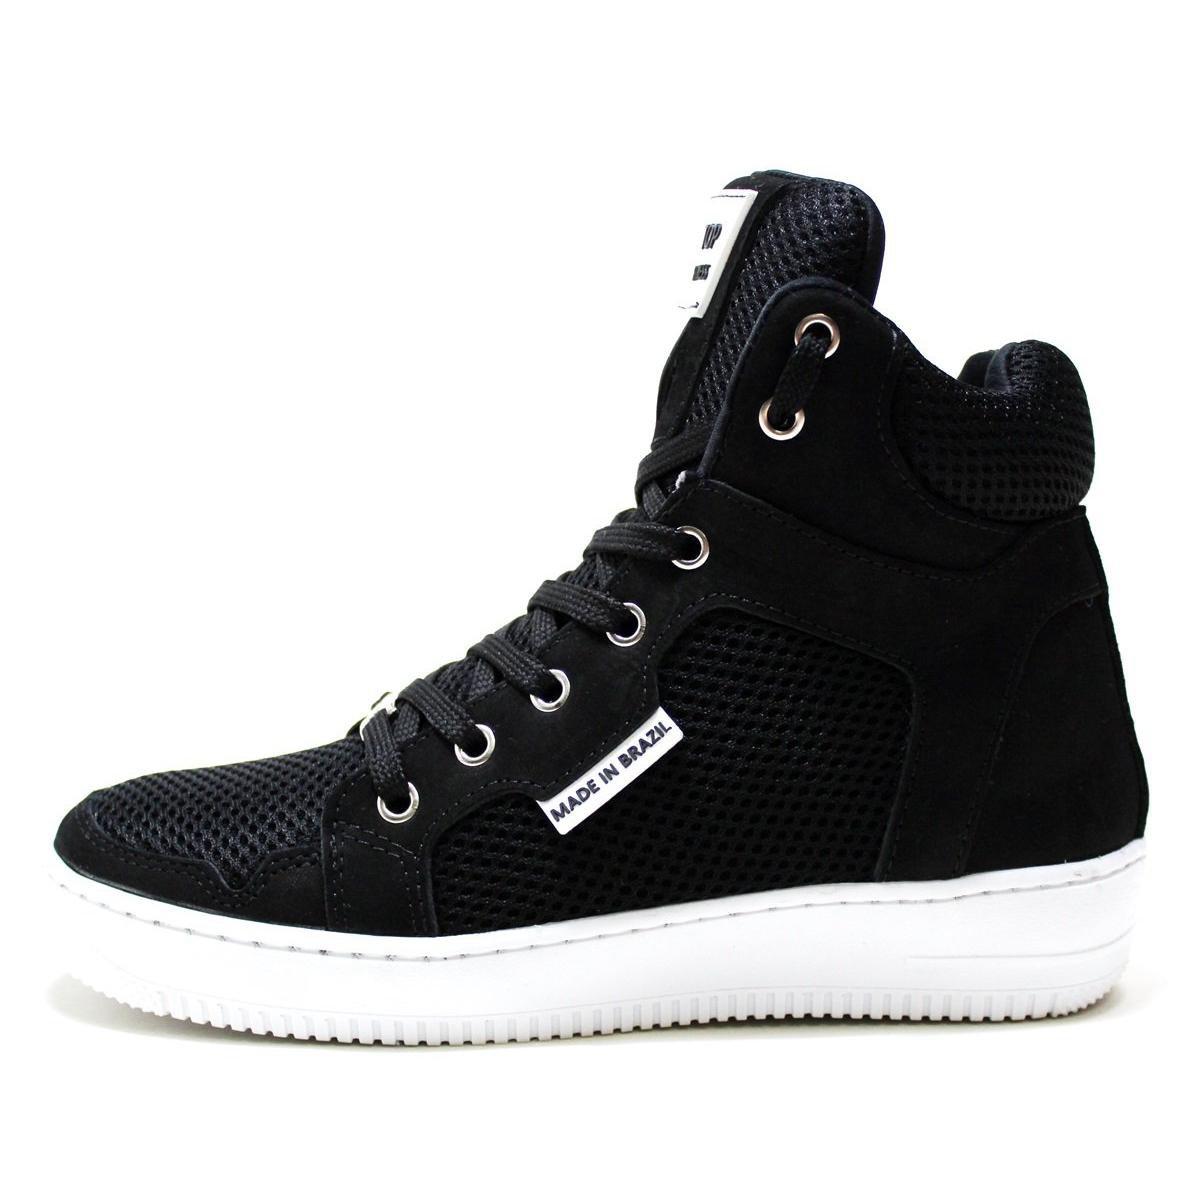 Tênis Sneaker Top Fitness Cano Alto Em Couro Masculino